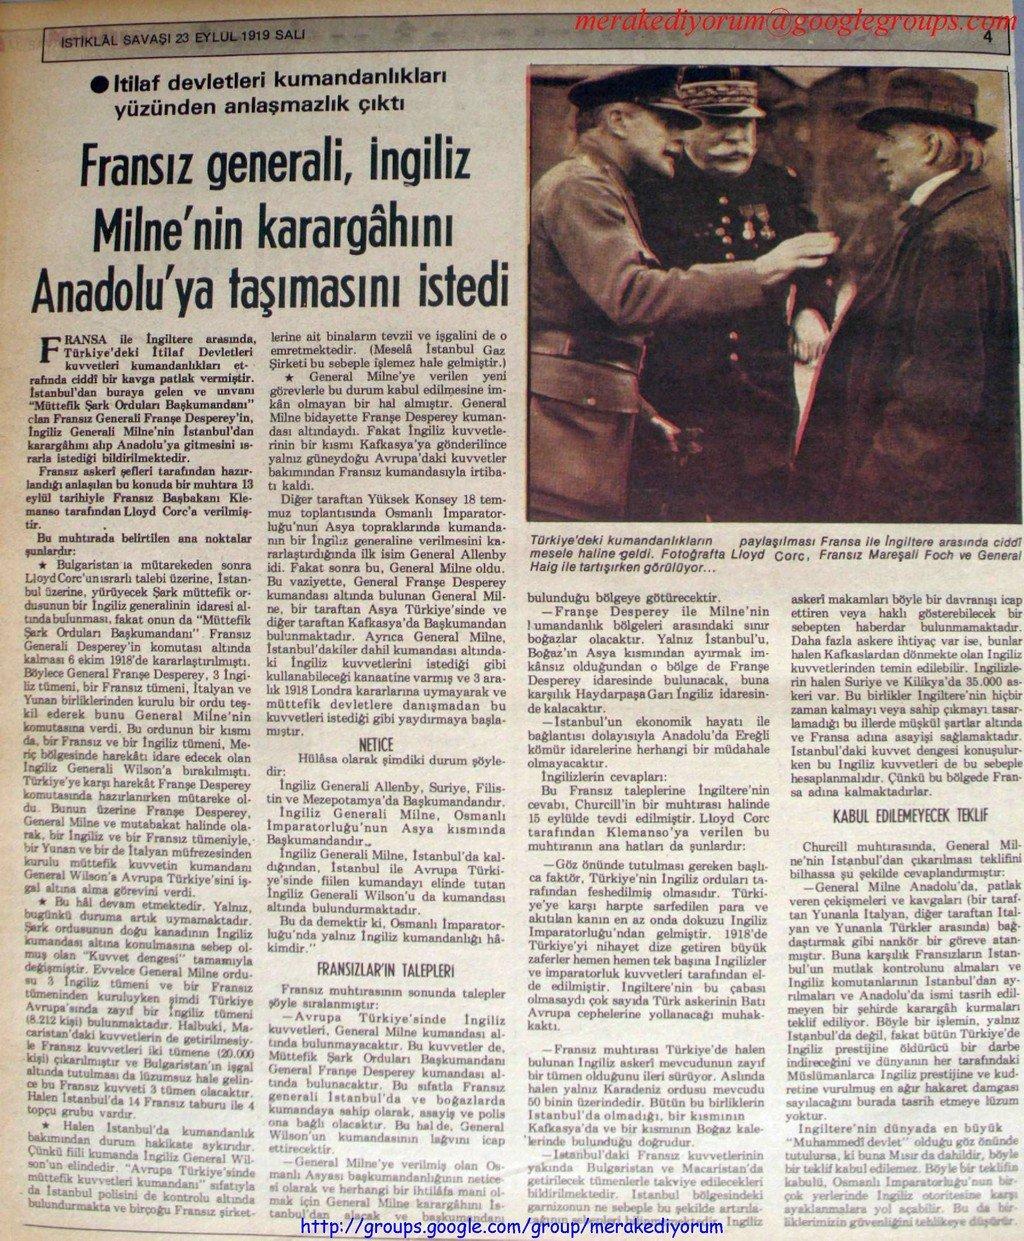 istiklal savaşı gazetesi - 23 eylül 1919